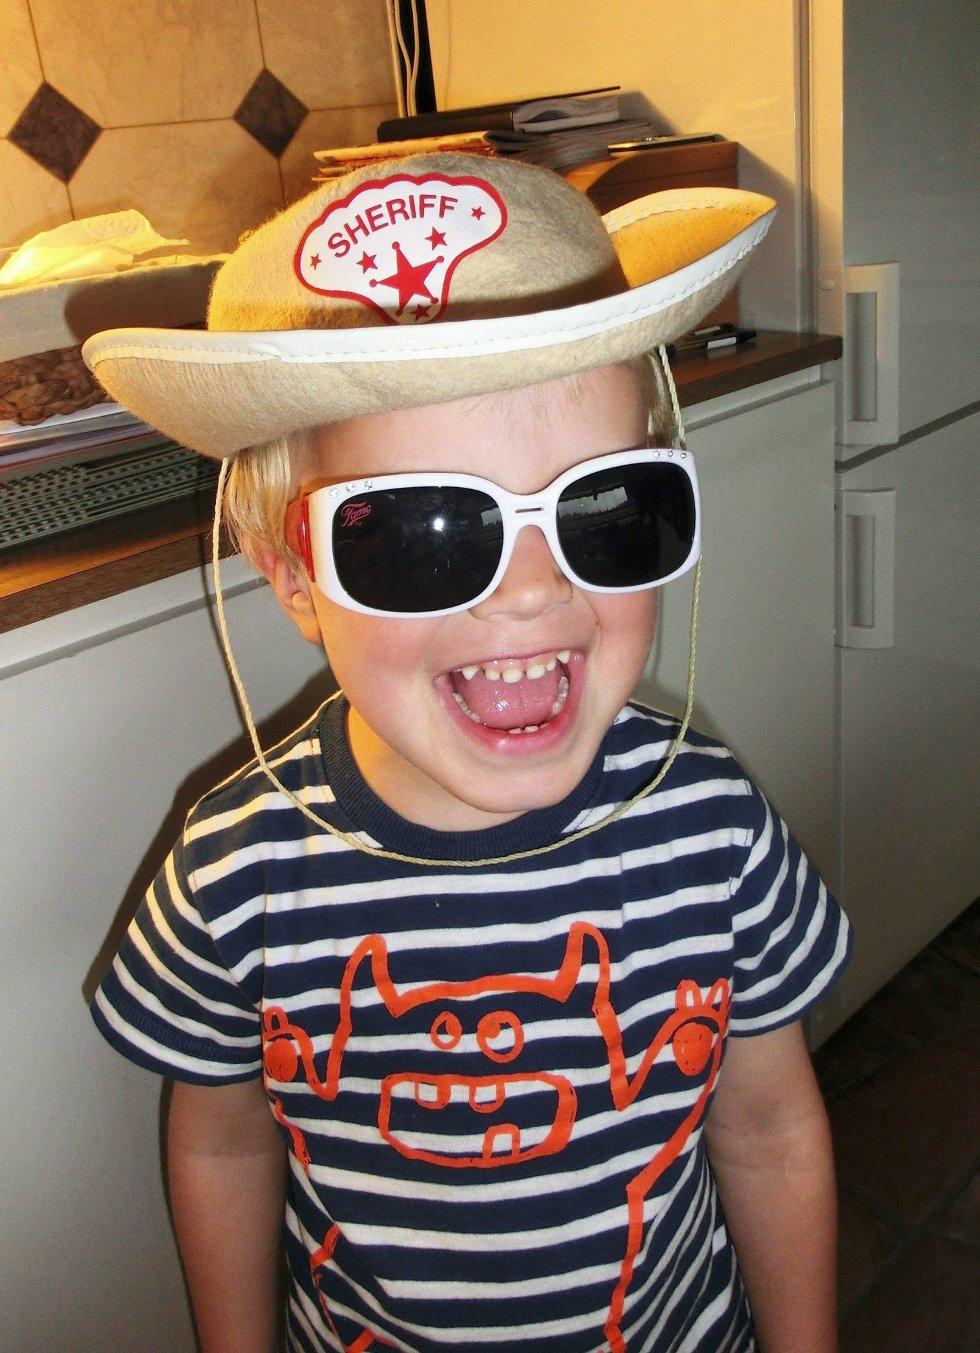 Cowboy-hilsen: Eivind med pappas cowboyhatt og nye solbriller hos farfar og farmor på Hjellebøl, hilser til søskenbarna sine på Løken! Foto: Bodil Stigen Dammerud (Foto: )